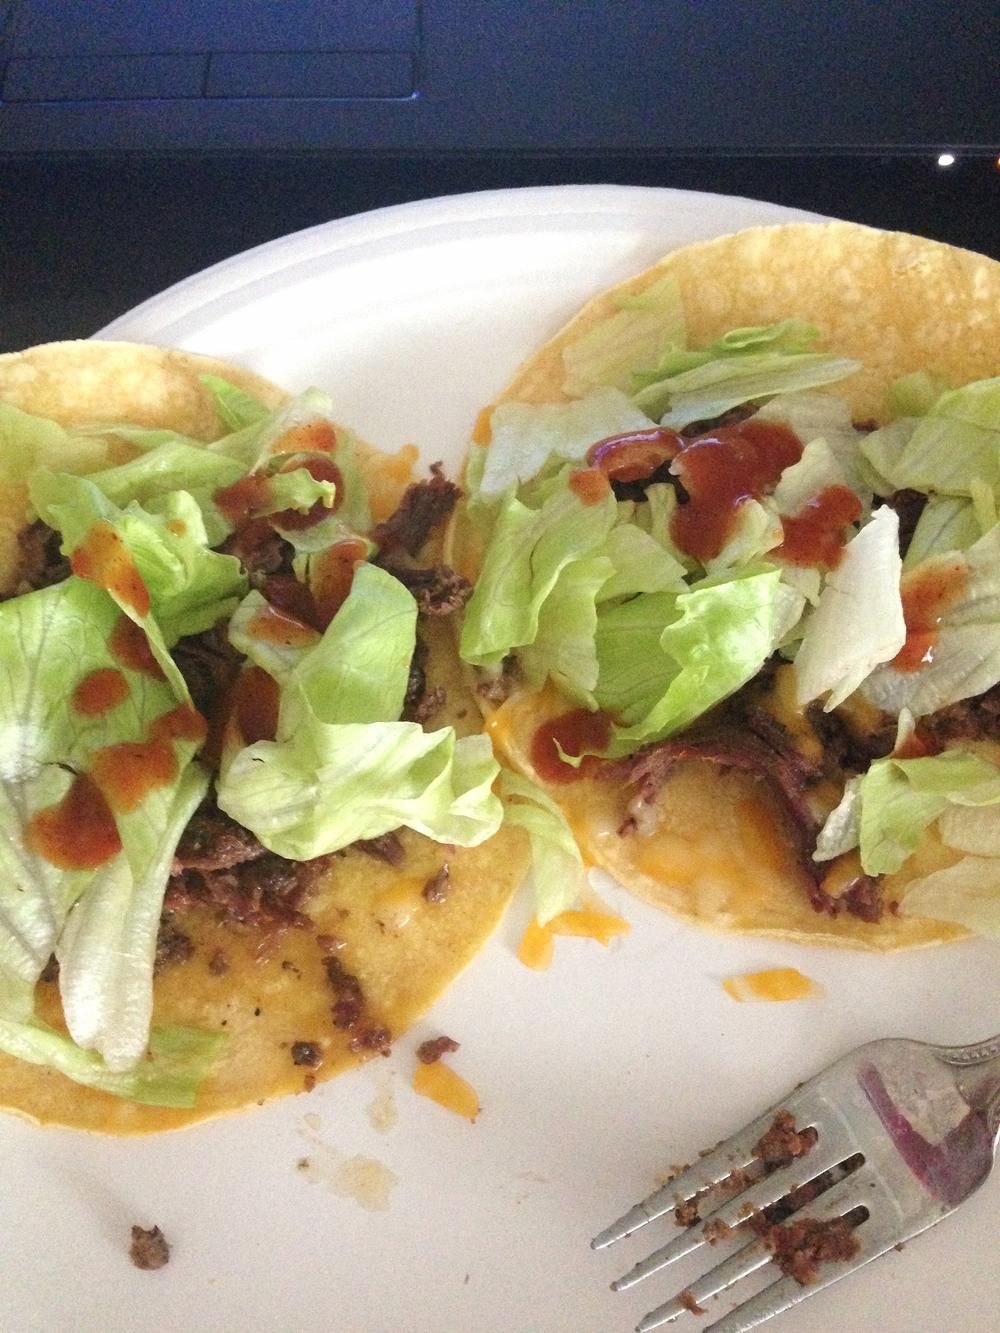 Lunch: Corn Tortillas, Shredded Beef, Iceberg Lettuce and Hot Sauce